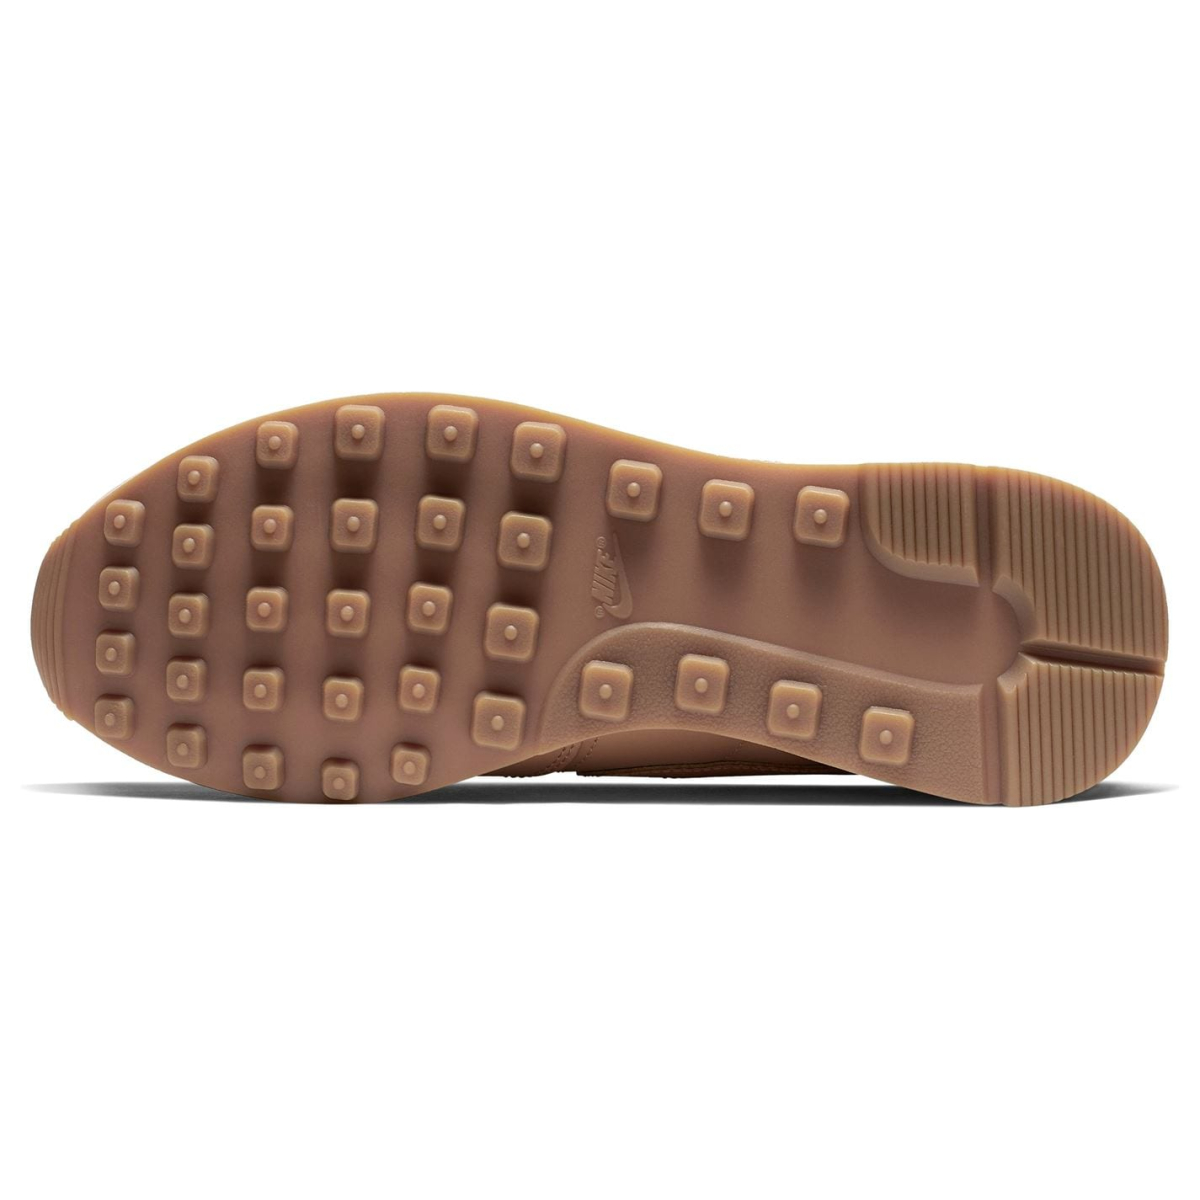 Nike Internationalist Premium Turnschuhe Damen Sneaker Sportschuhe Laufschuhe 31